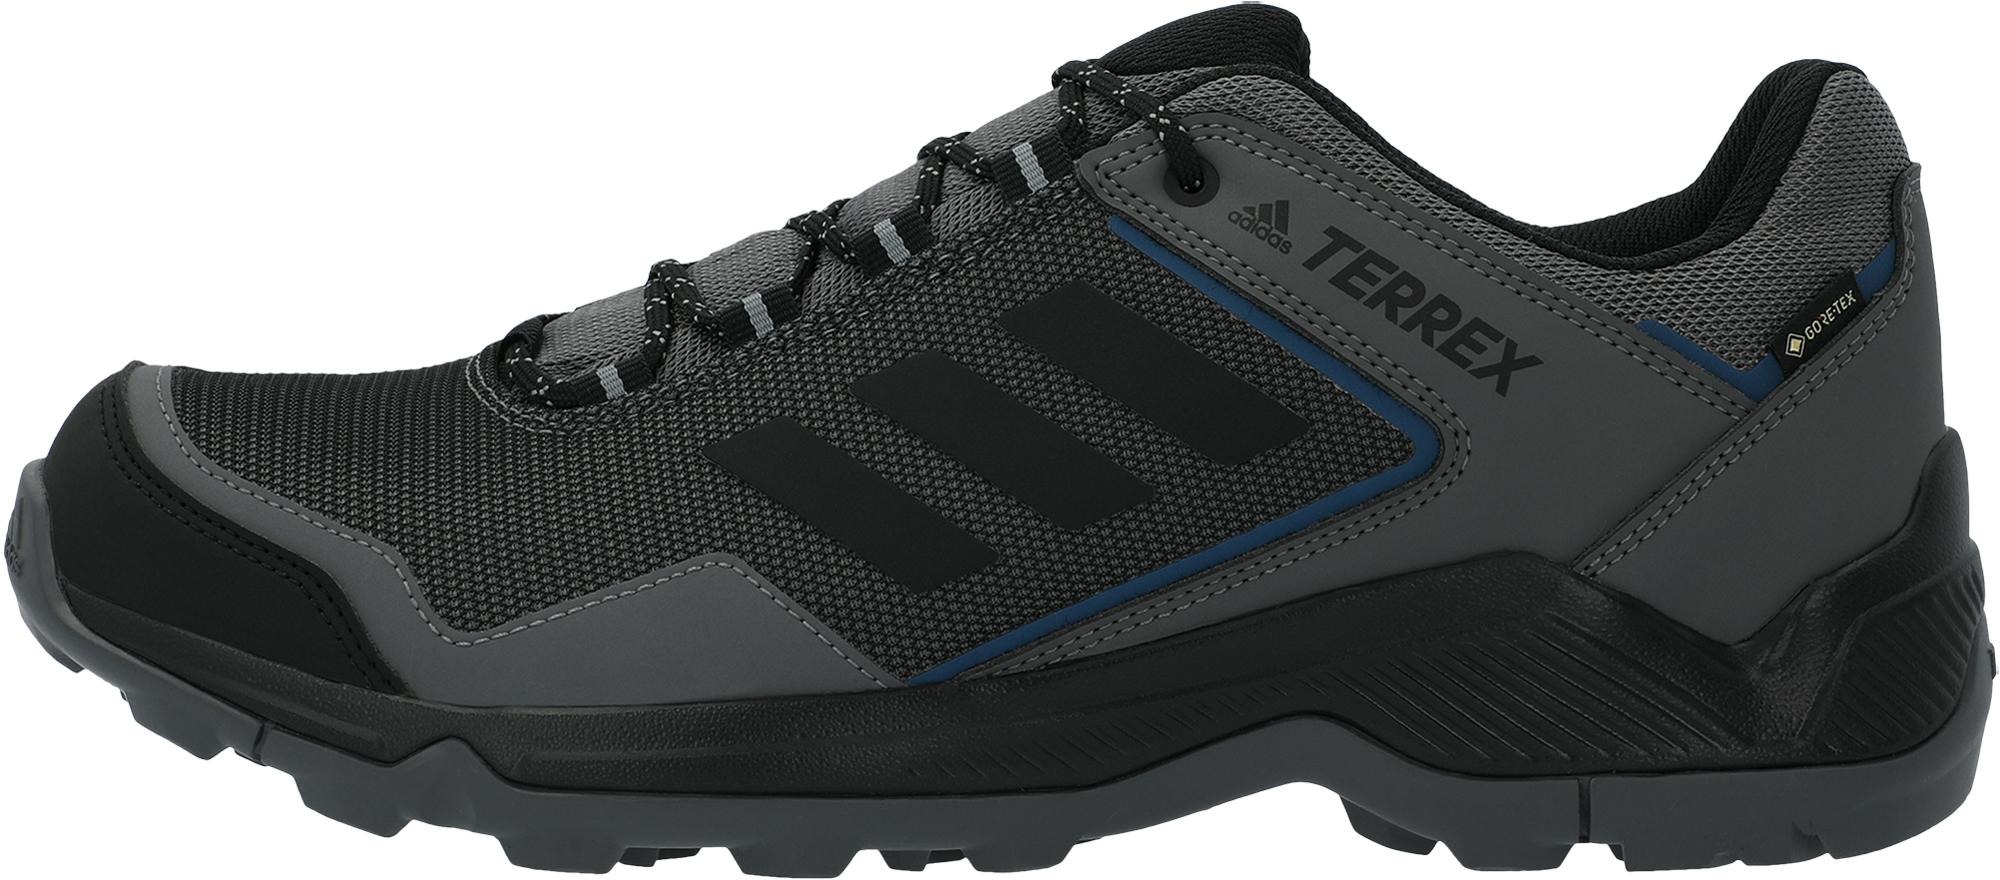 Adidas Полуботинки мужские Adidas Terrex Eastrail GTX, размер 44 adidas ботинки мужские adidas terrex tivid mid climaproof размер 40